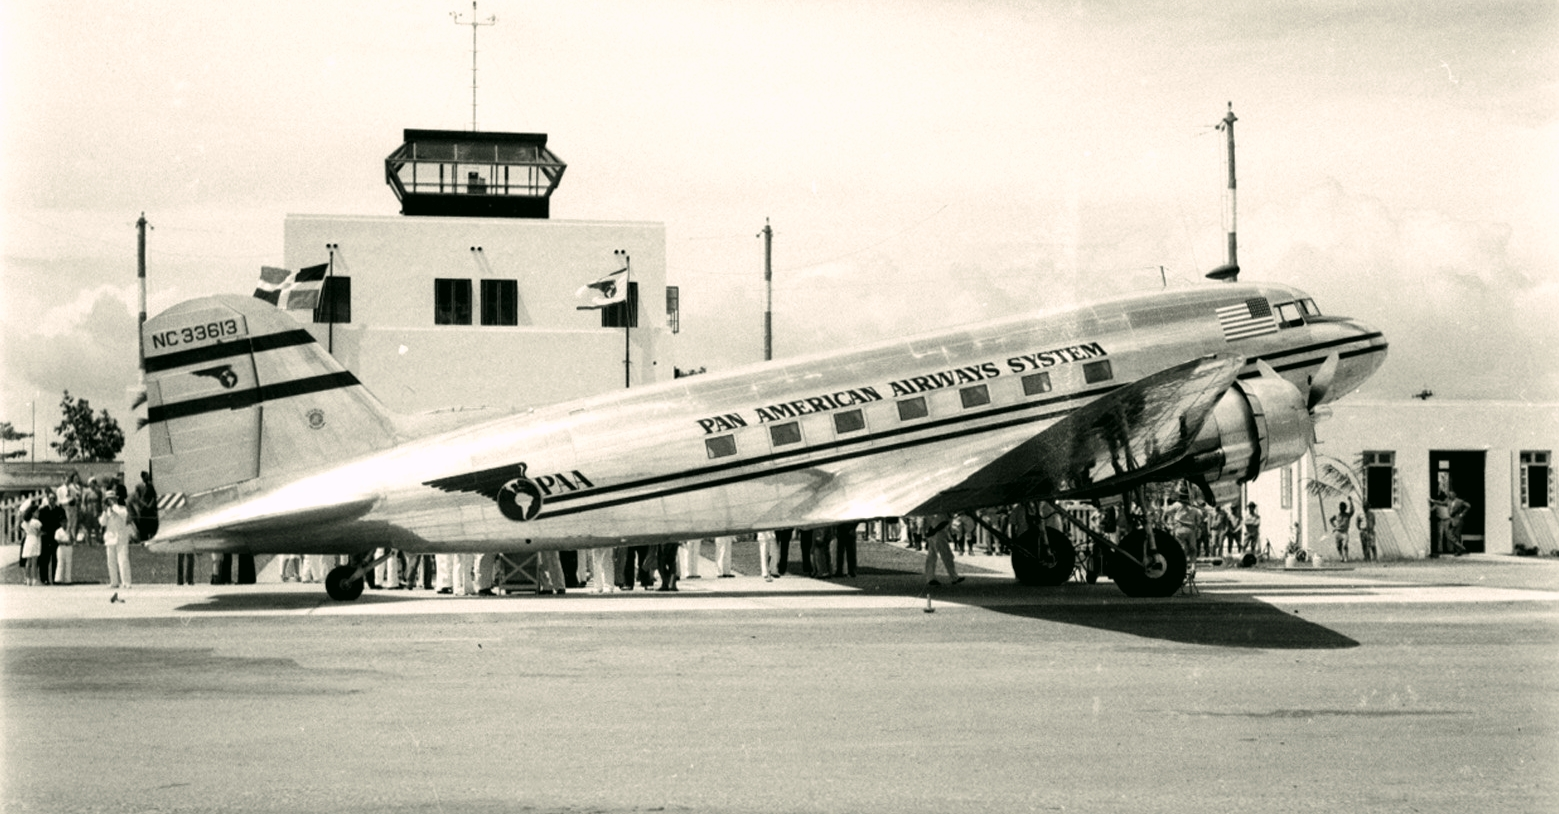 Pan American DC-3 at Santo Domingo (Dax M Roman photo)